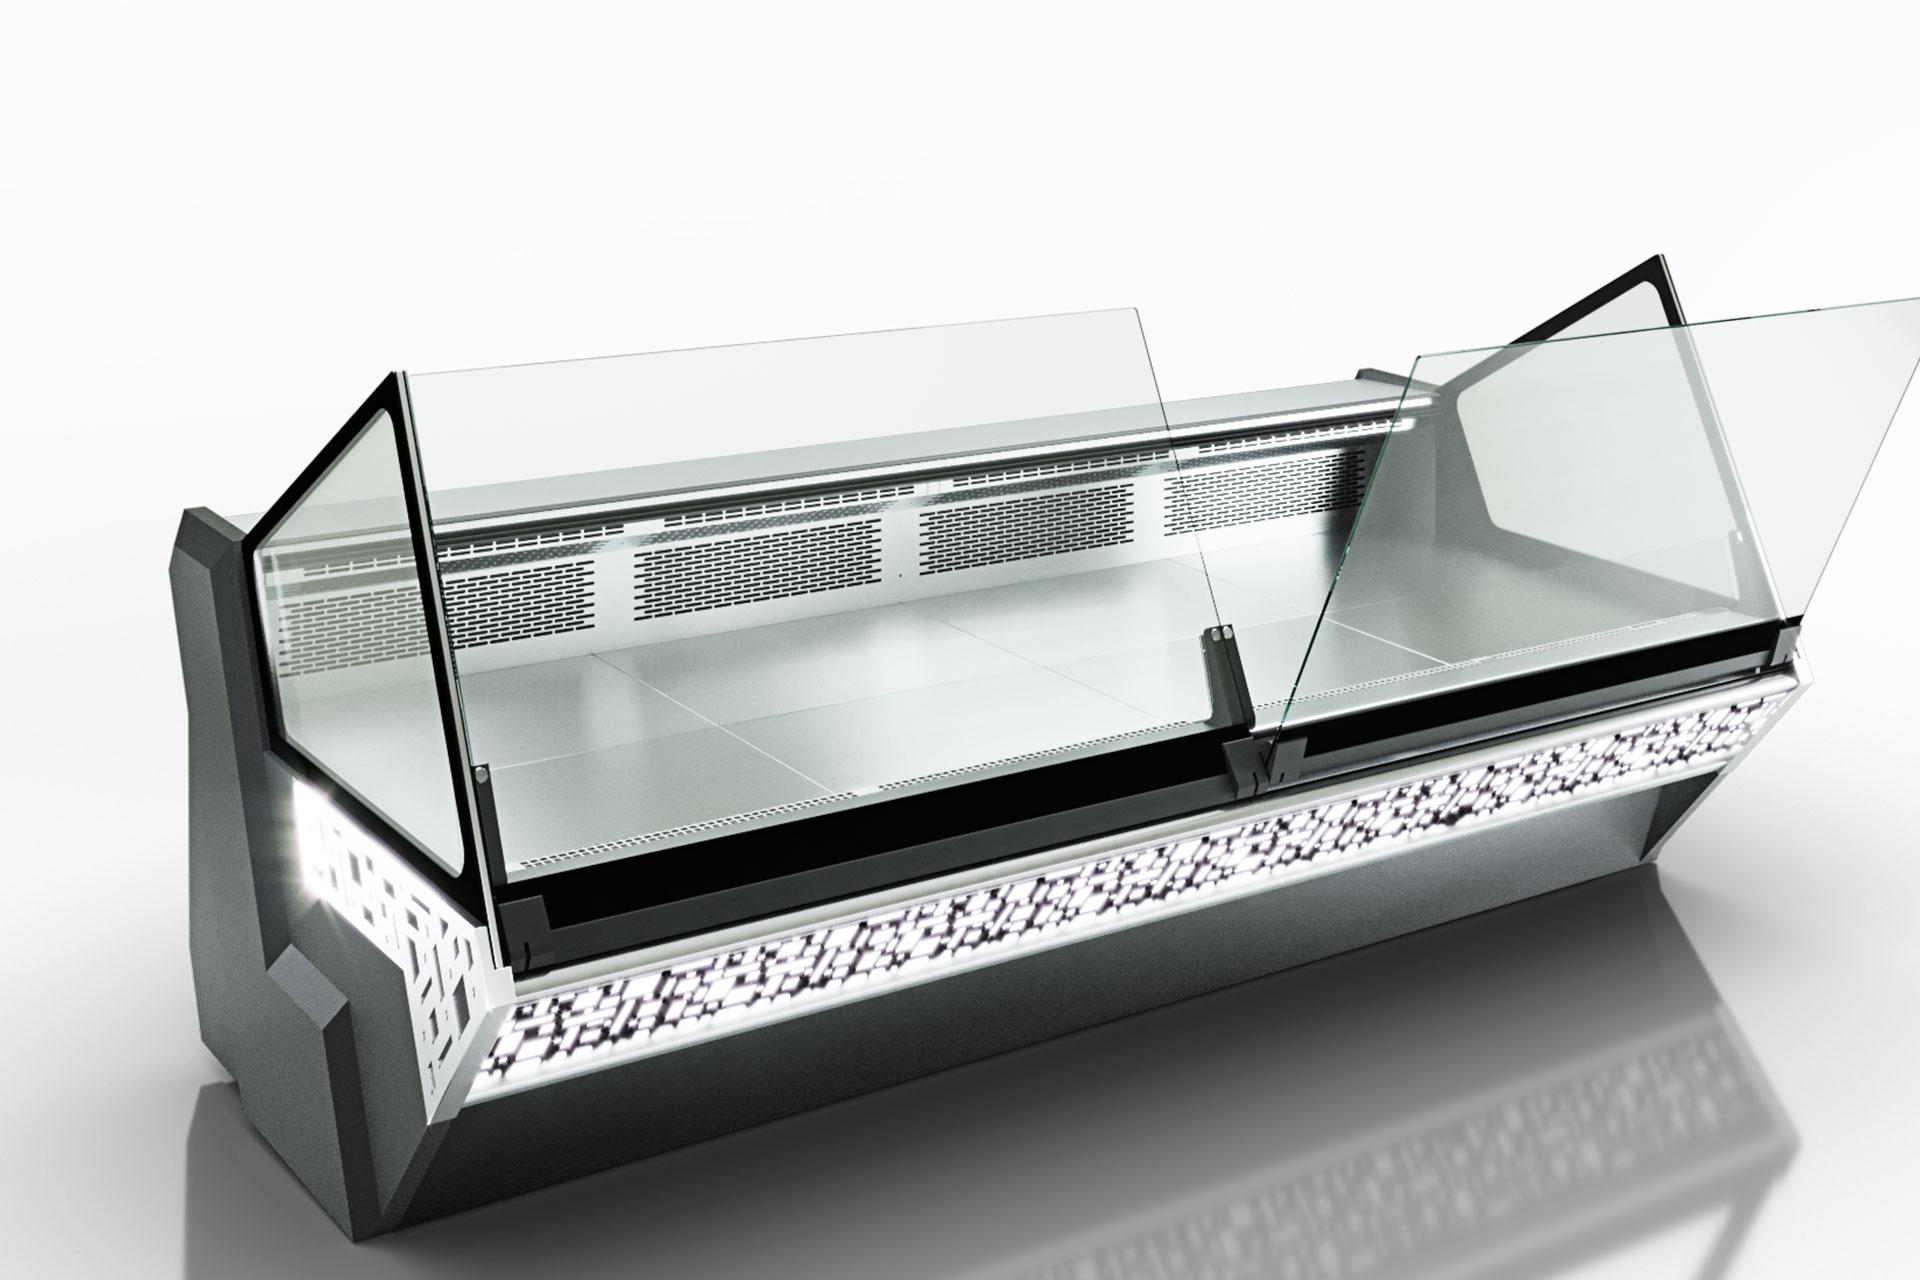 Витрина Missouri sapphire MK 115 deli OS 117-DBM